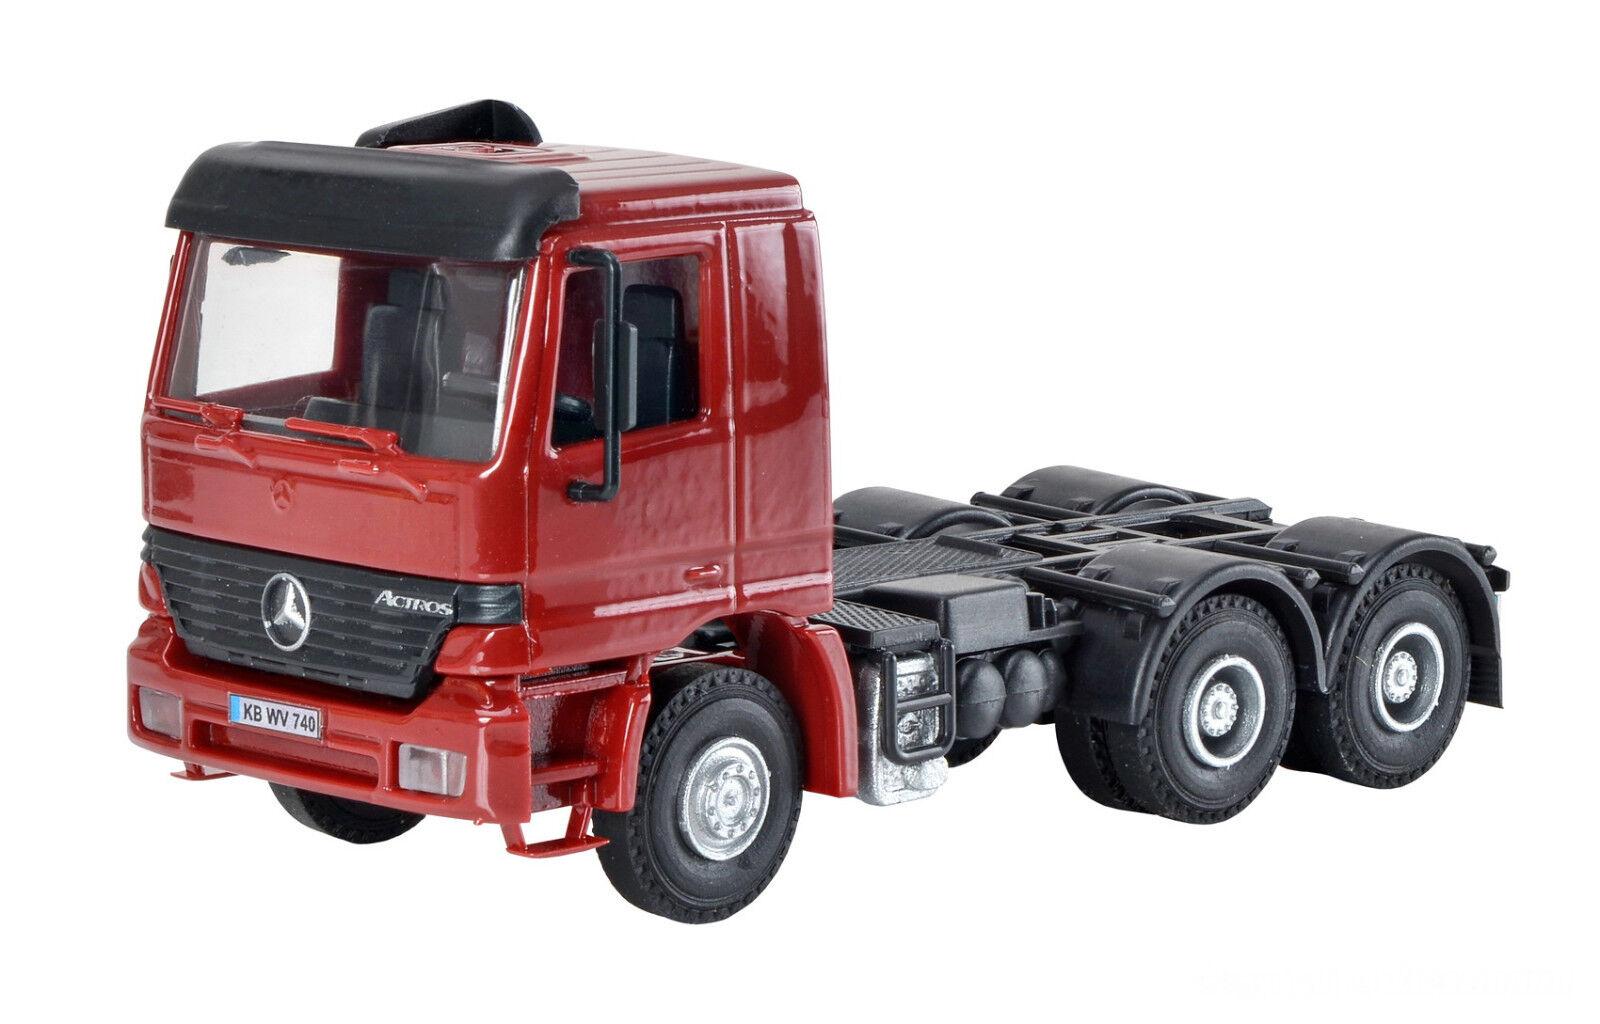 H0 MB ACTROS 3-achs Tractor Kit 1 87, Kibri 14664